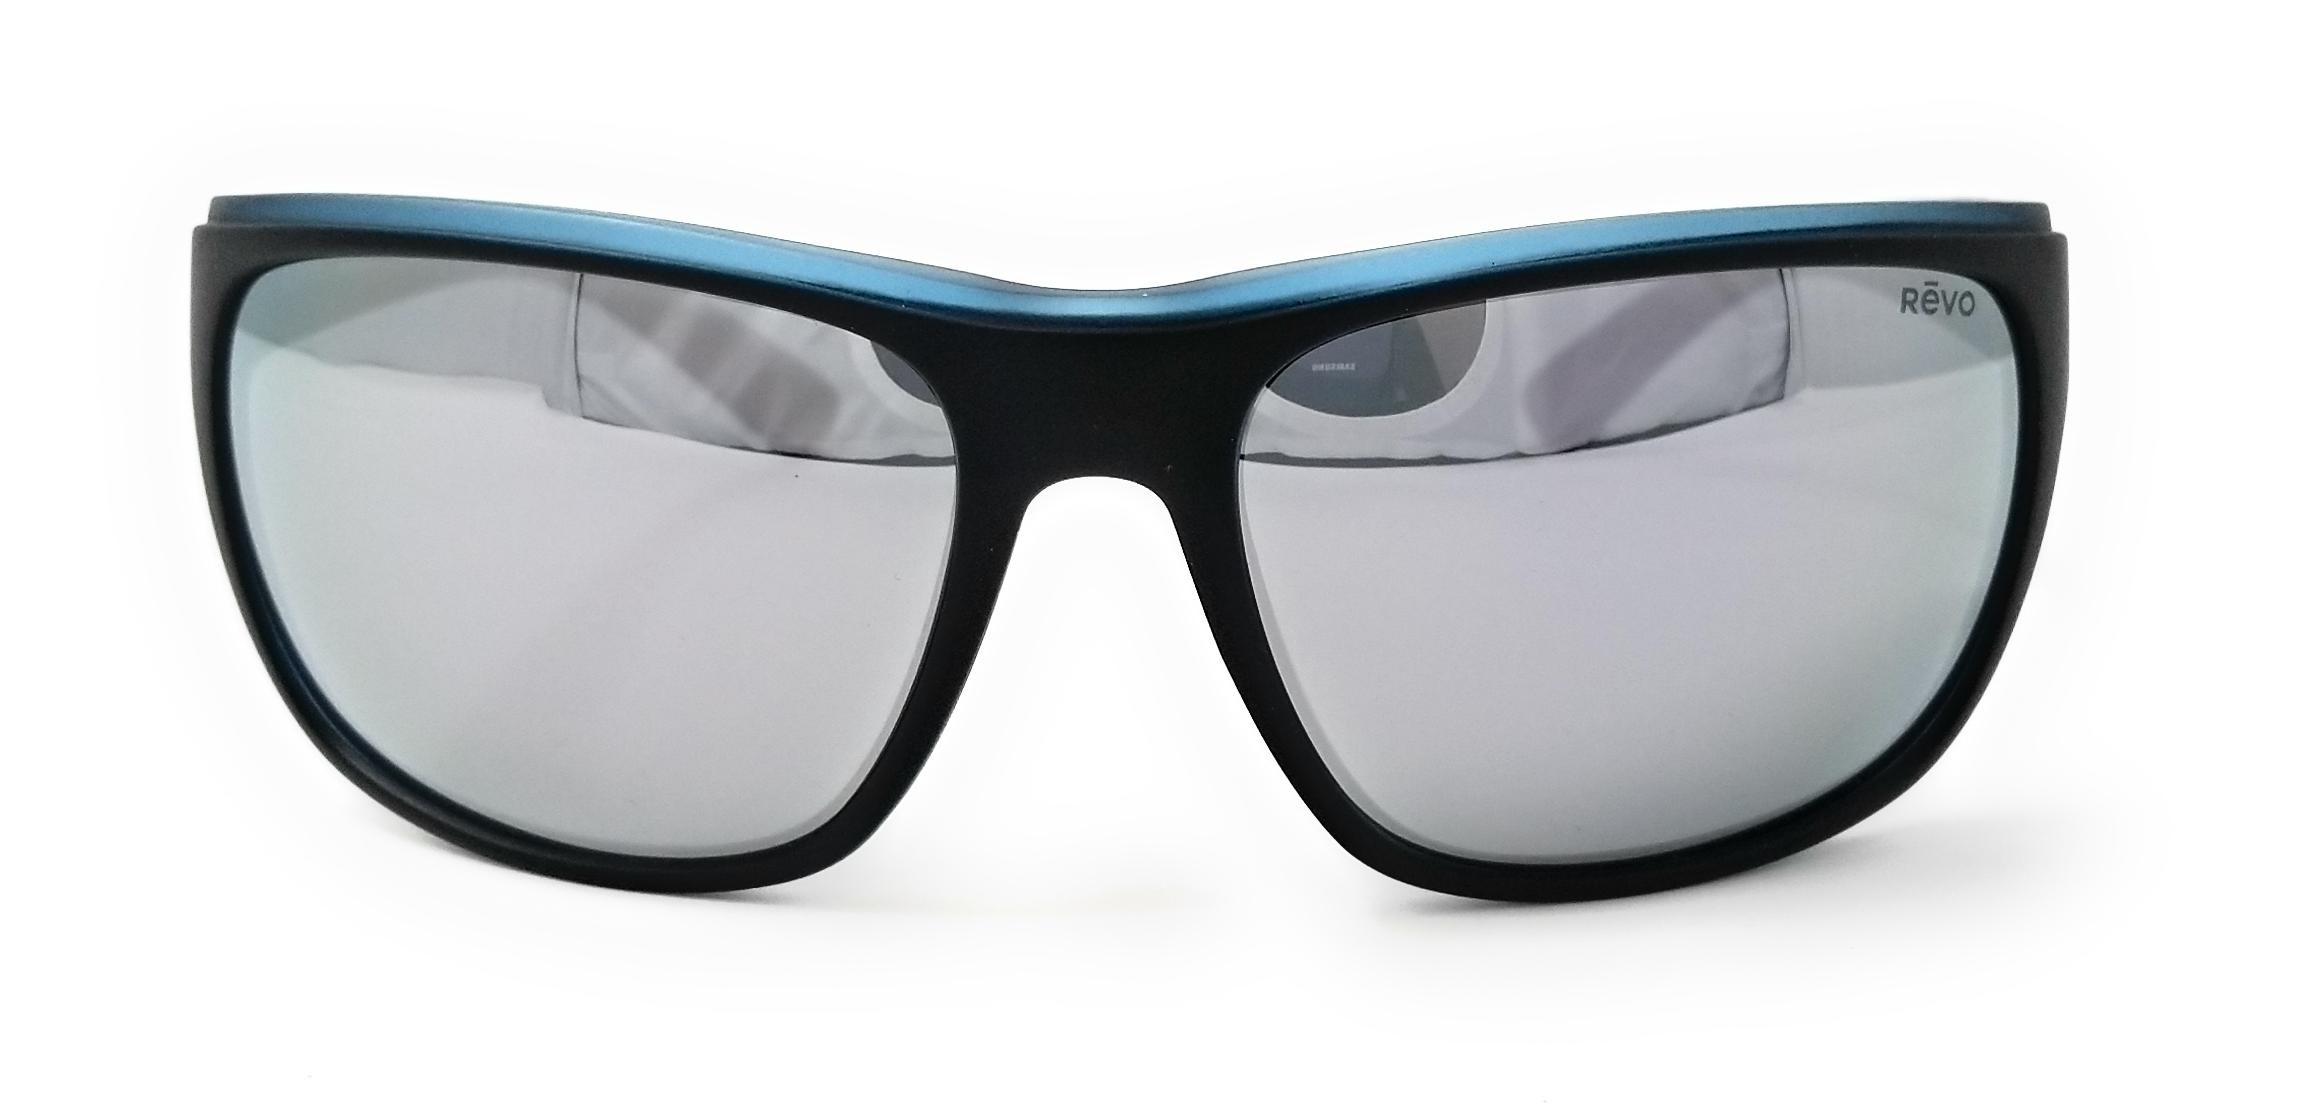 5f16f3da43 Revo Sunglasses Remus 1023 19ST MATTE BLACK GREY STEALTH Polarized ...